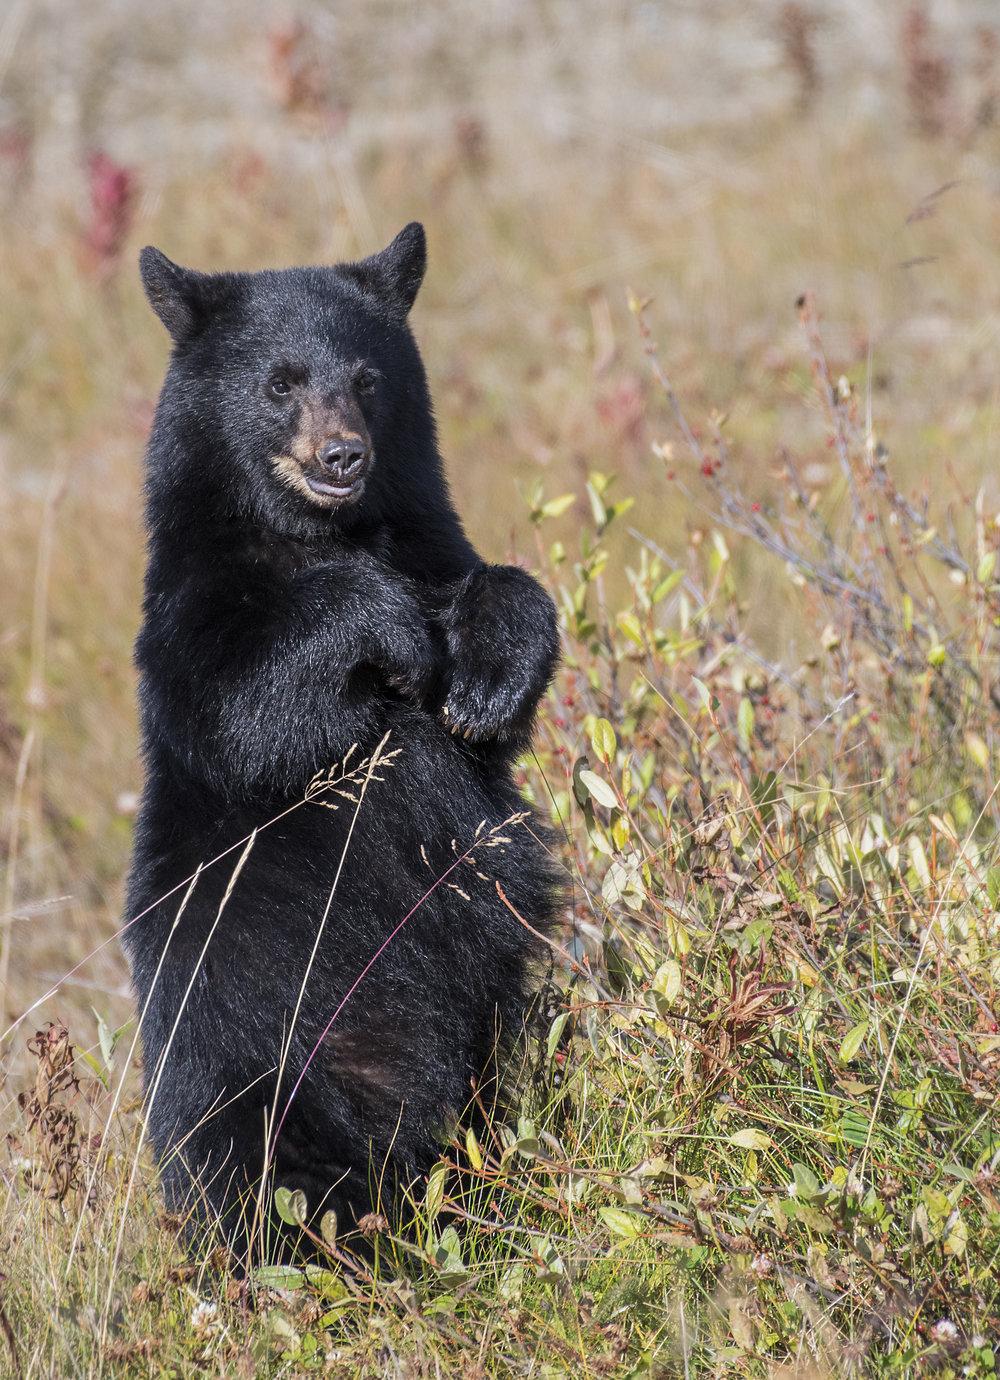 Canadian bear photography workshops